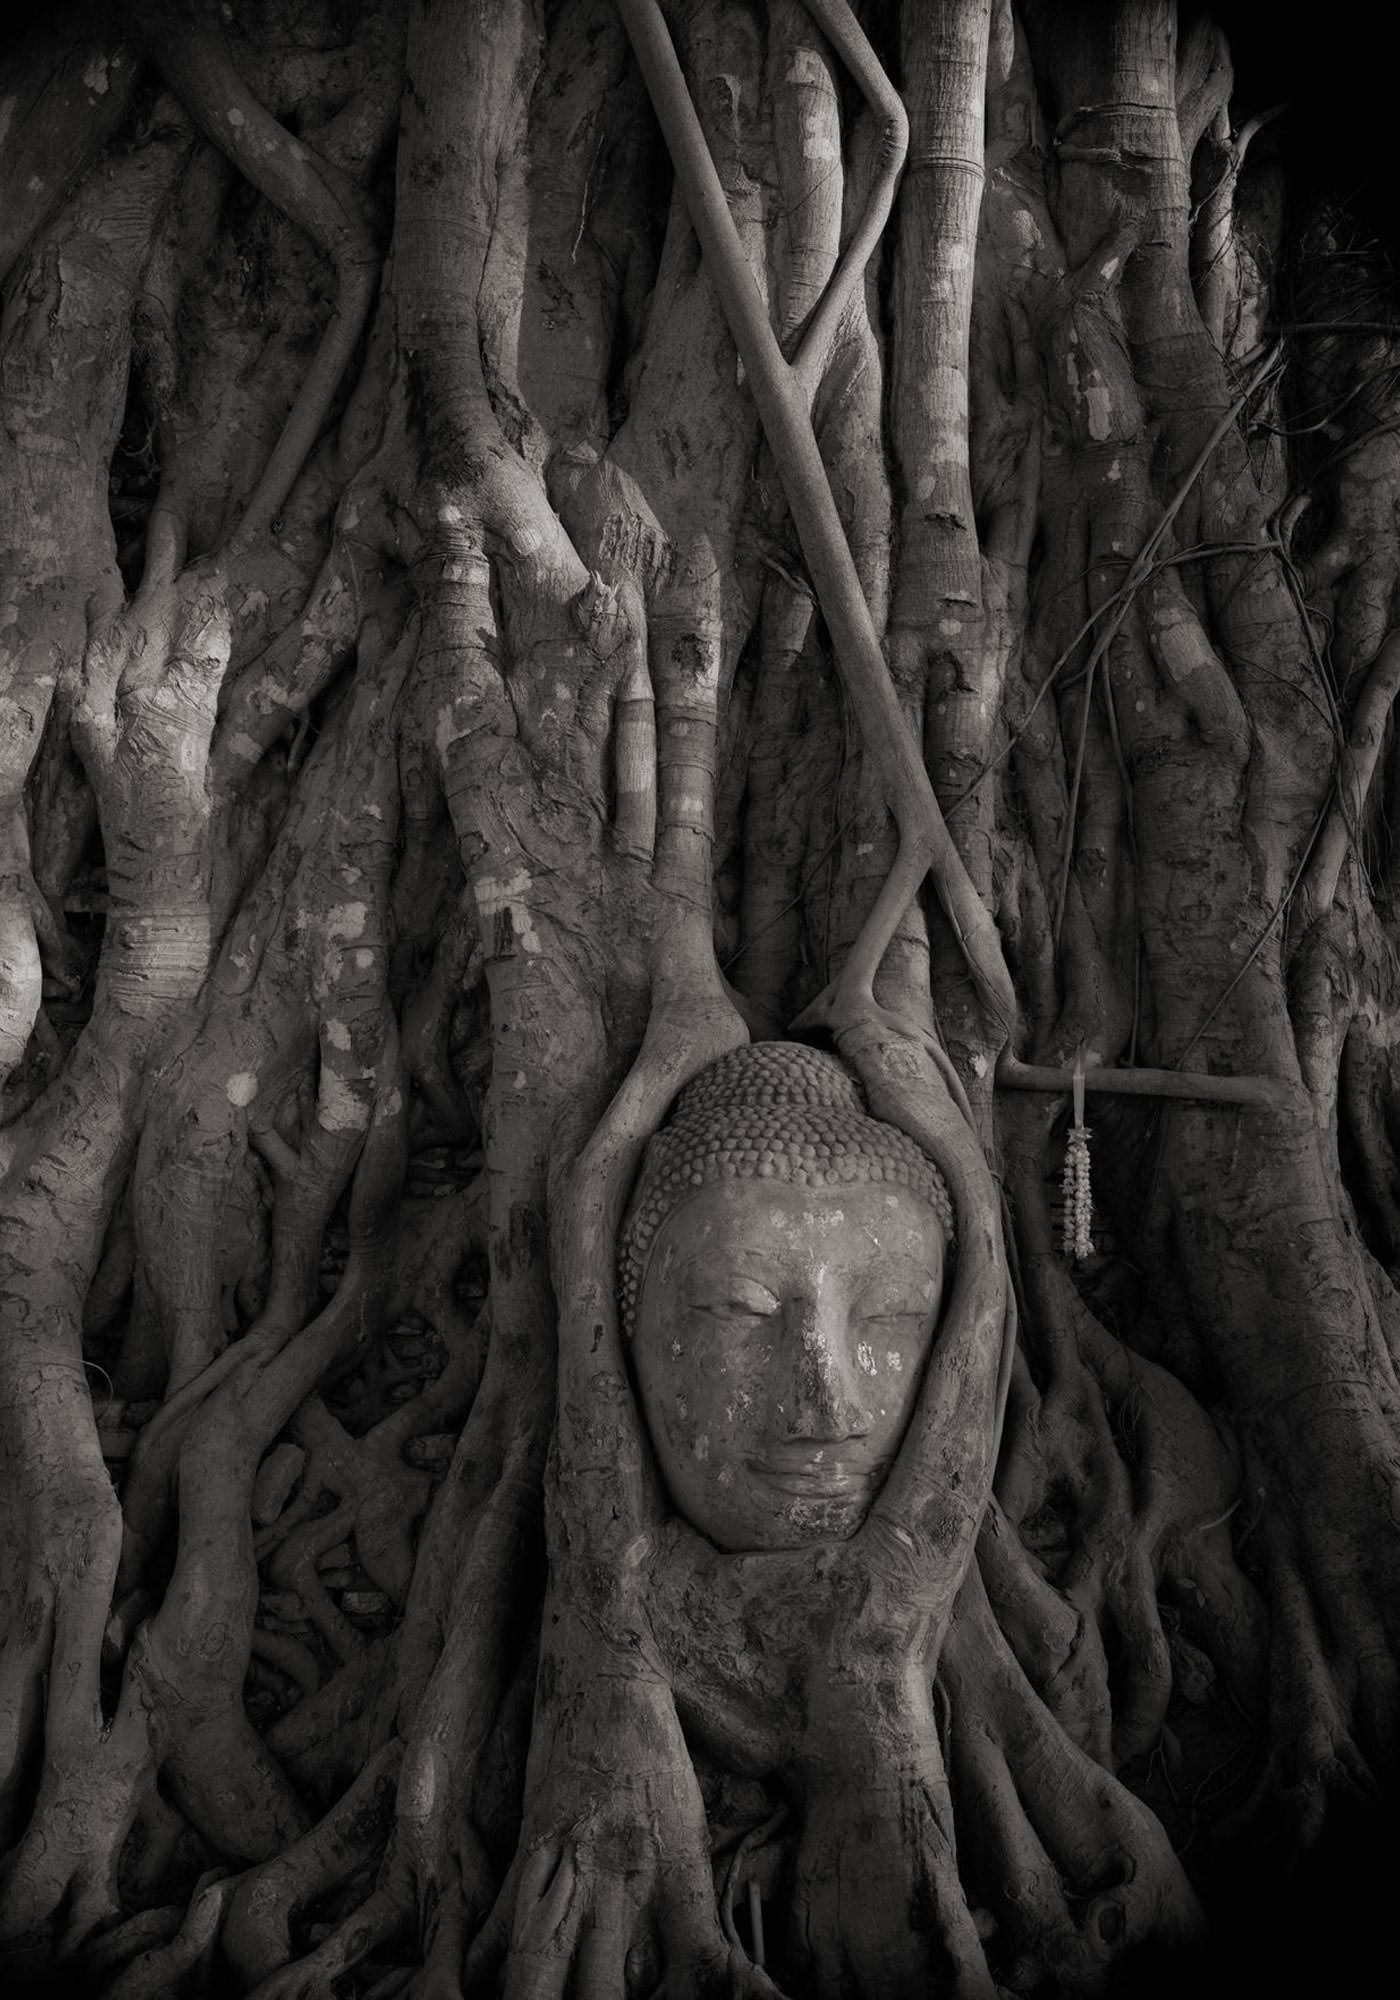 Kenro Izu Photographie Sacred Places Howard Greenberg Gallery